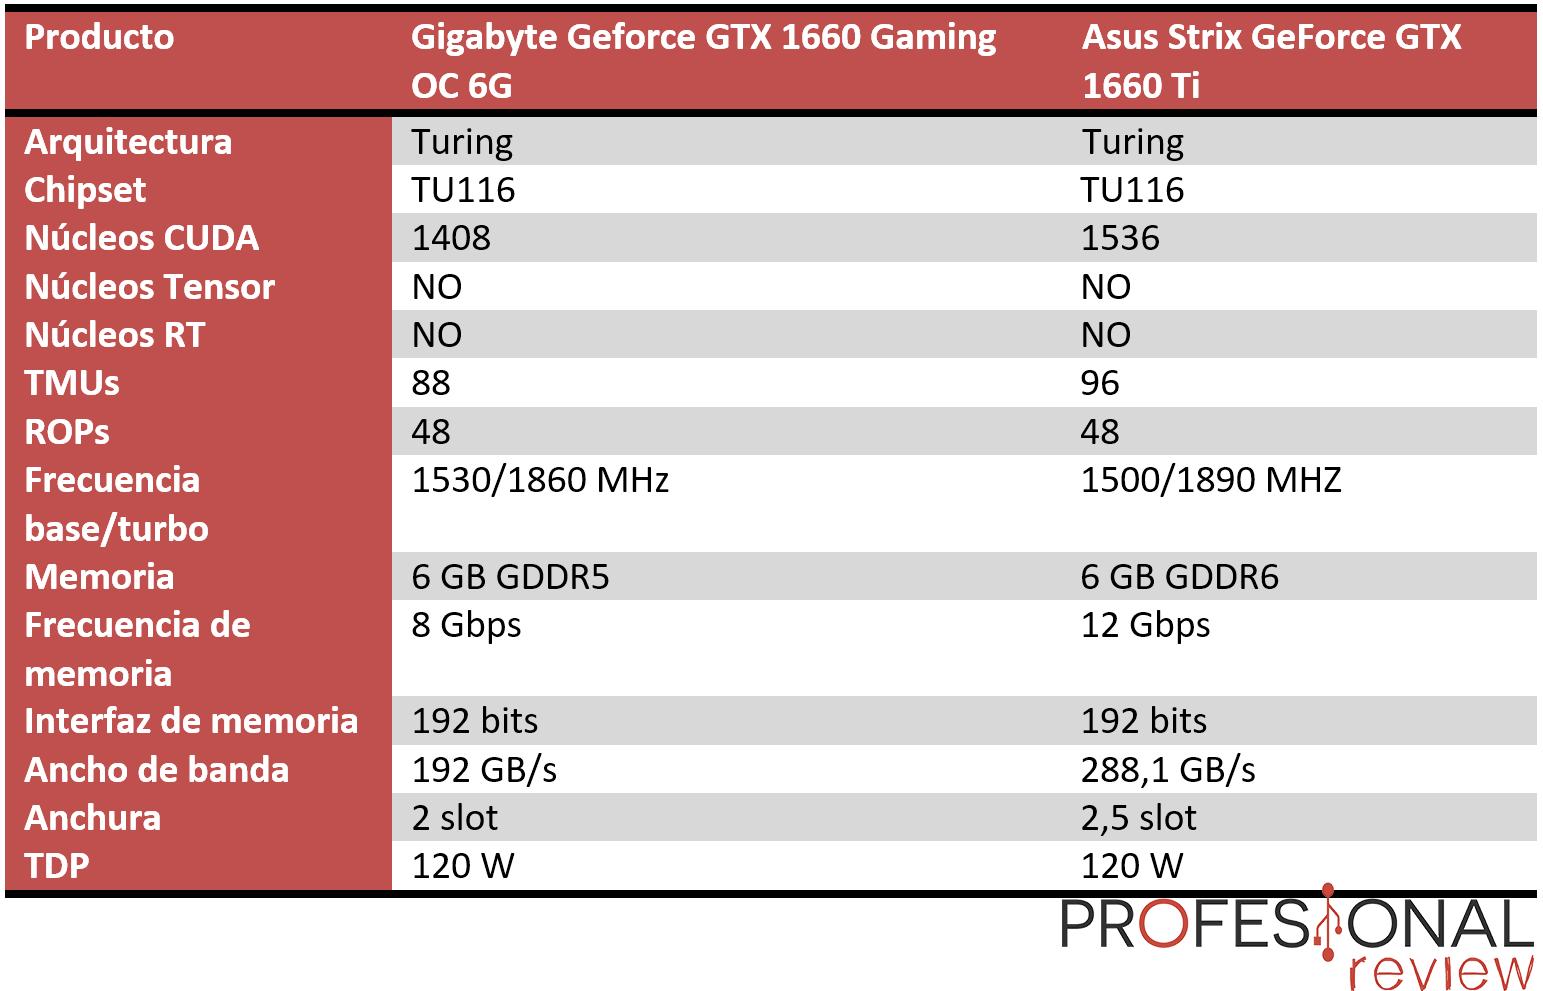 Nvidia GTX 1660 vs GTX 1660 Ti specs